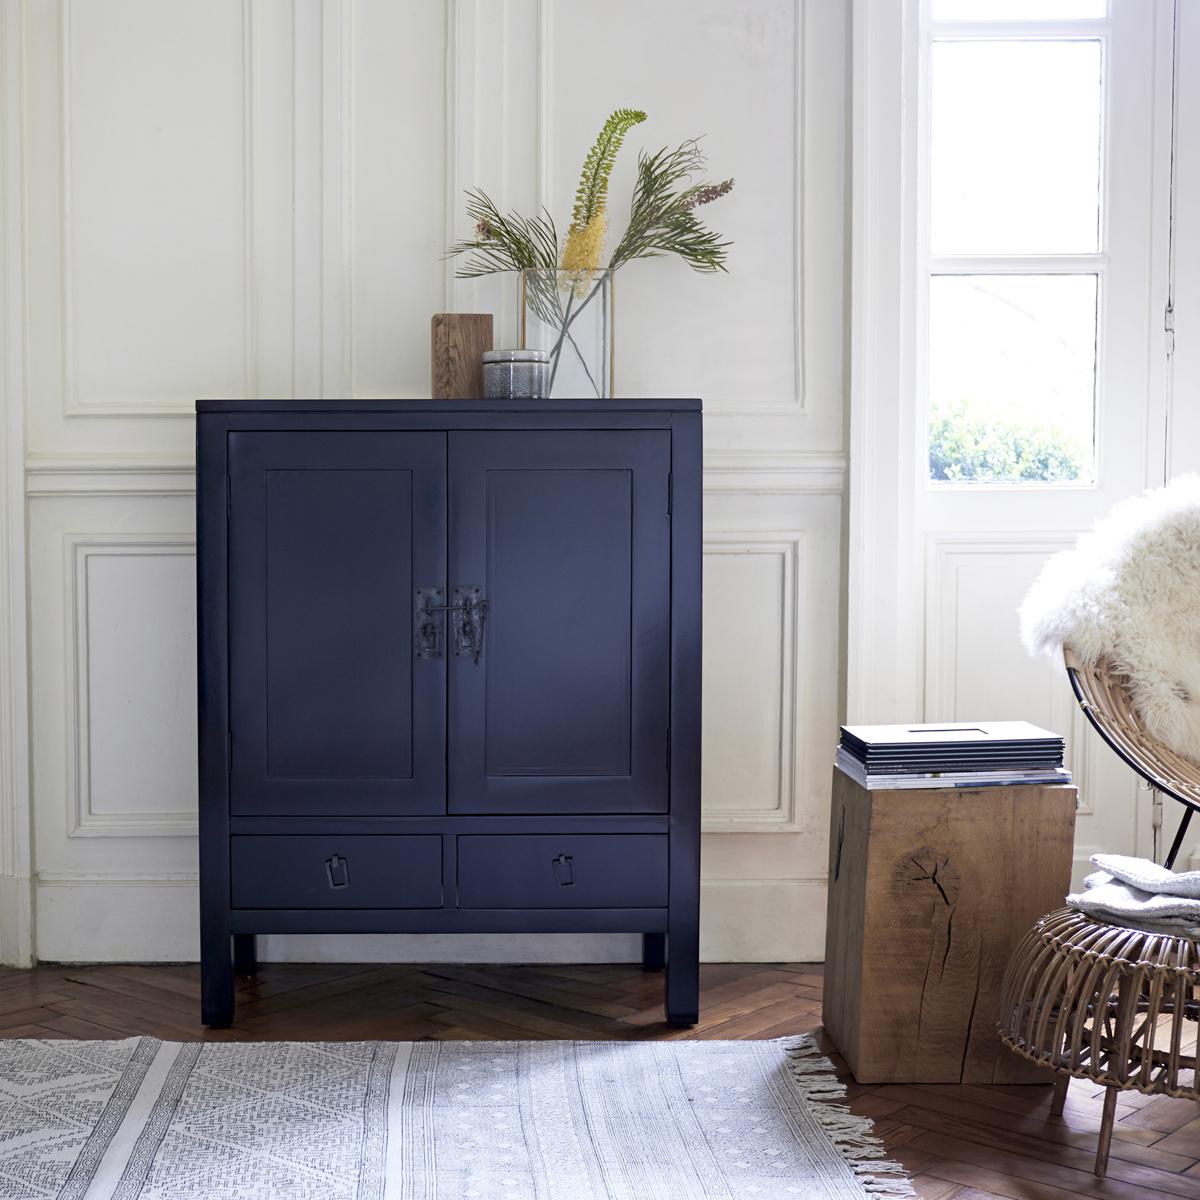 Thaki black wenge Dresser 80 cm